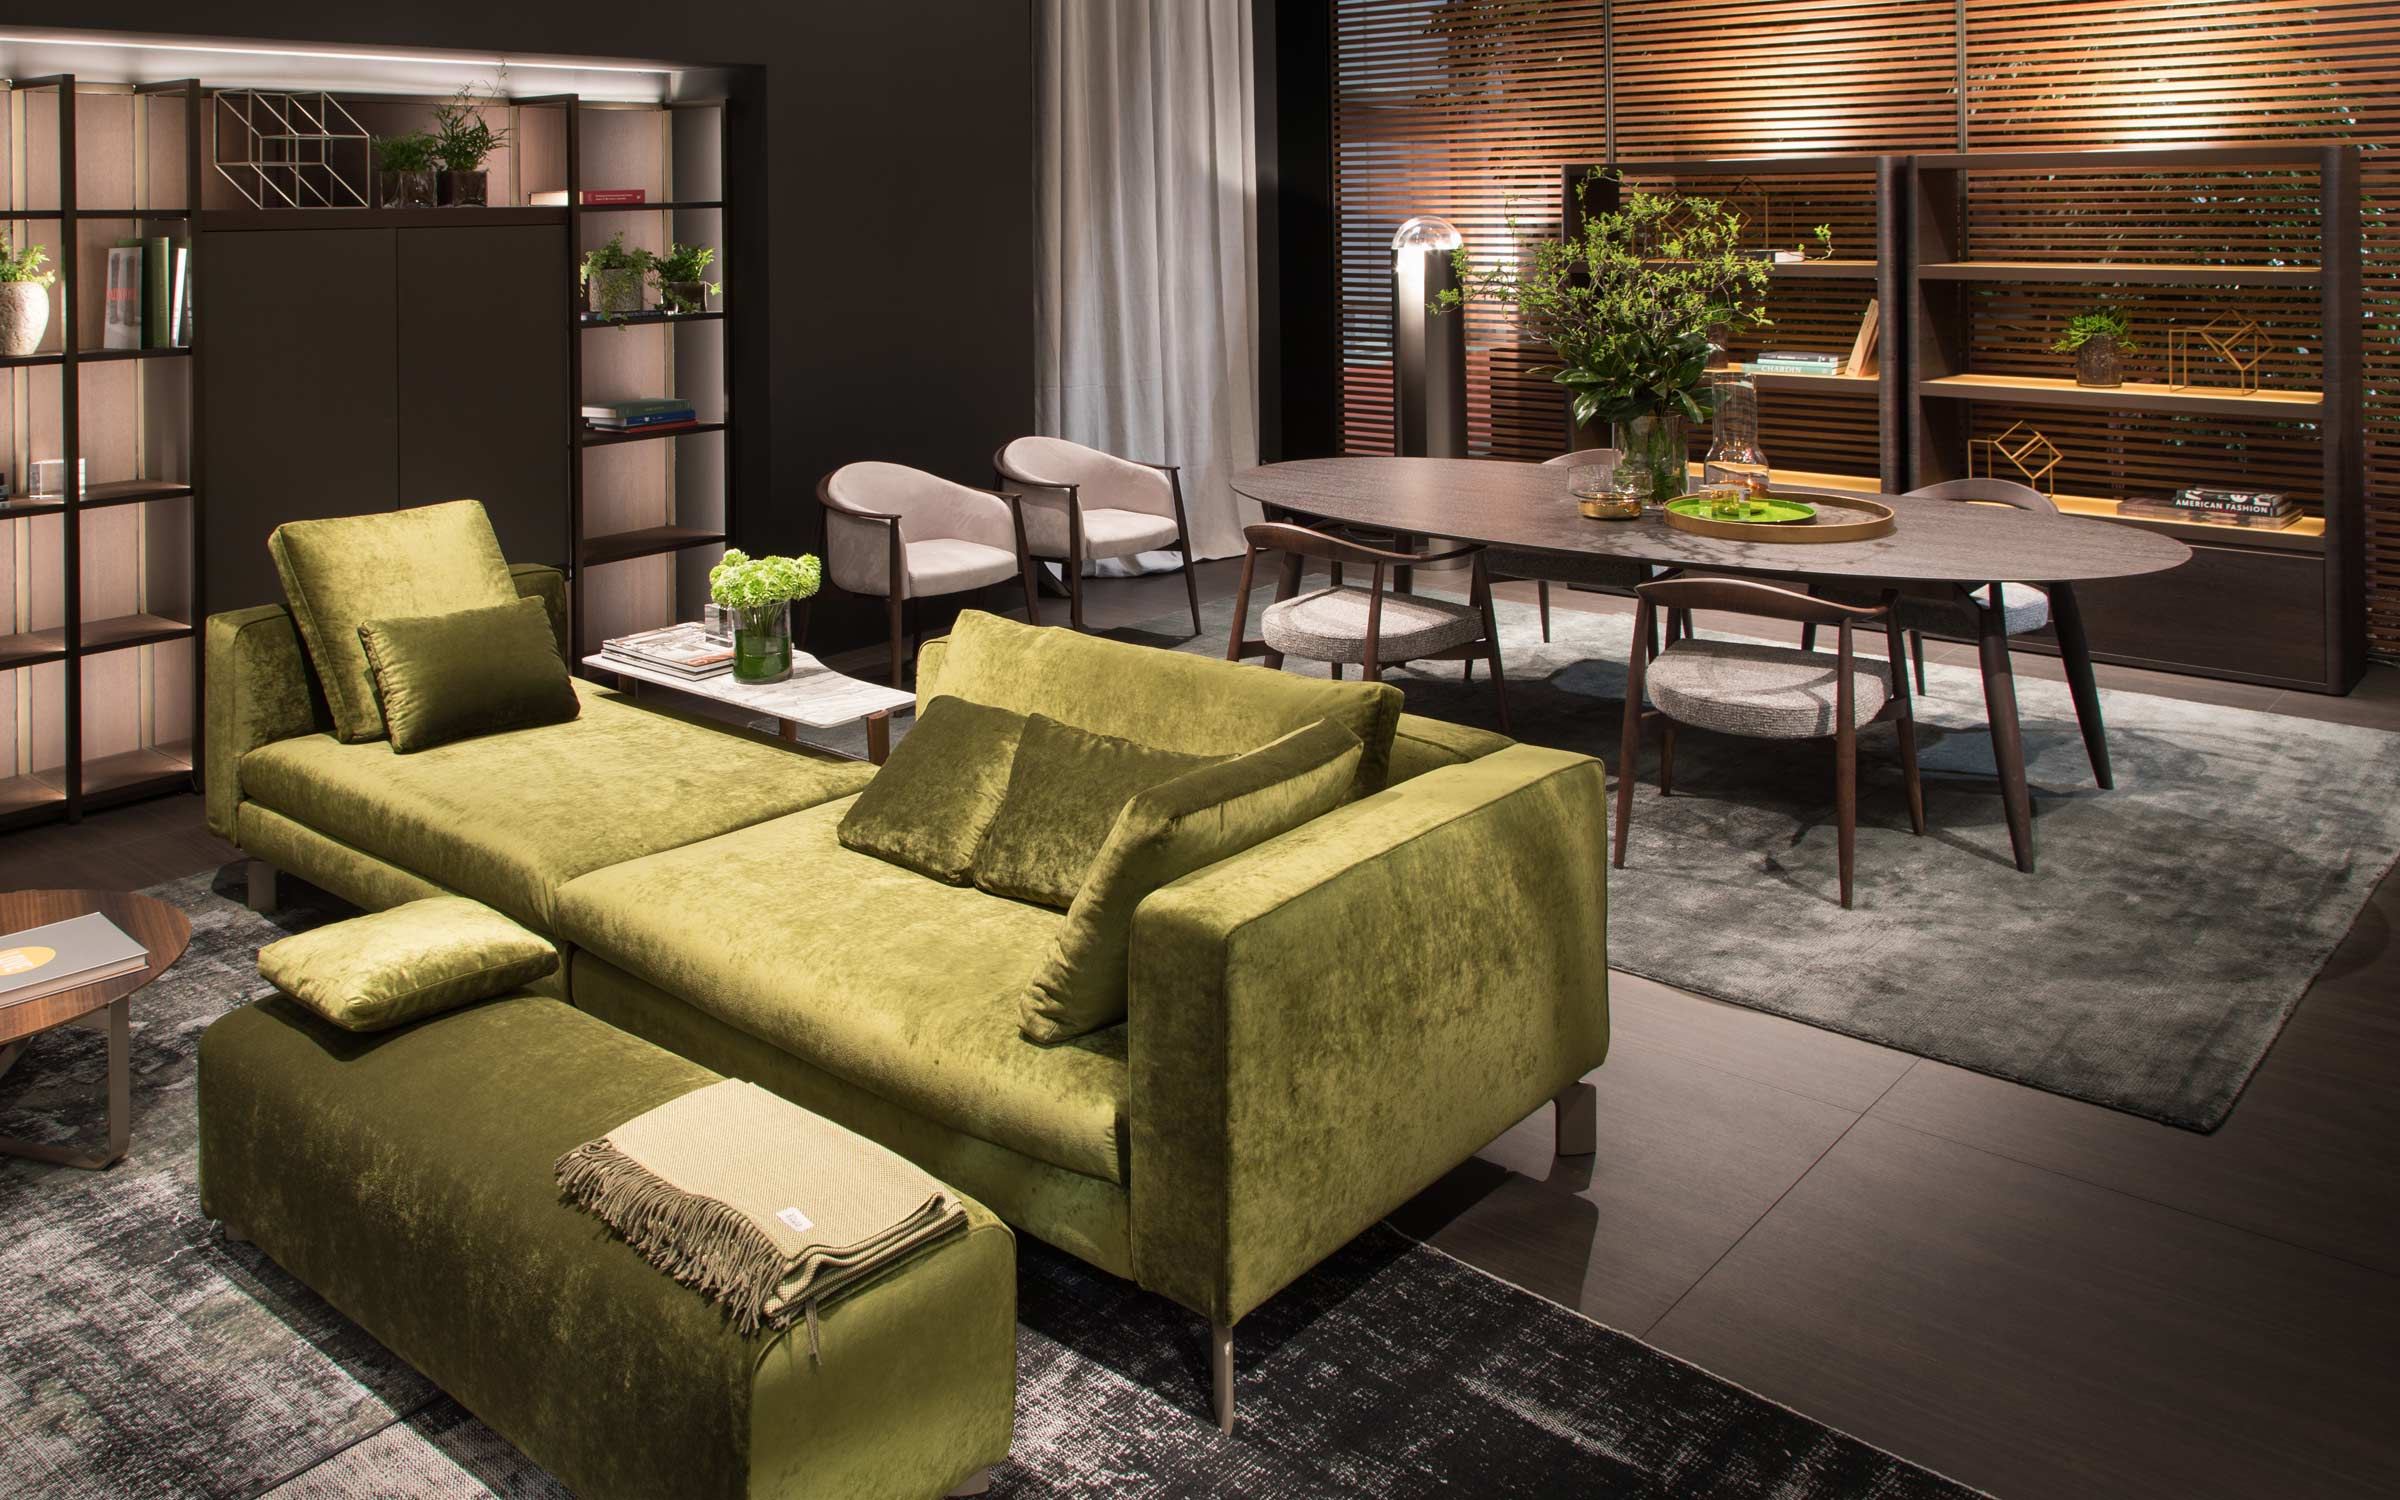 flou neuheiten 2017. Black Bedroom Furniture Sets. Home Design Ideas